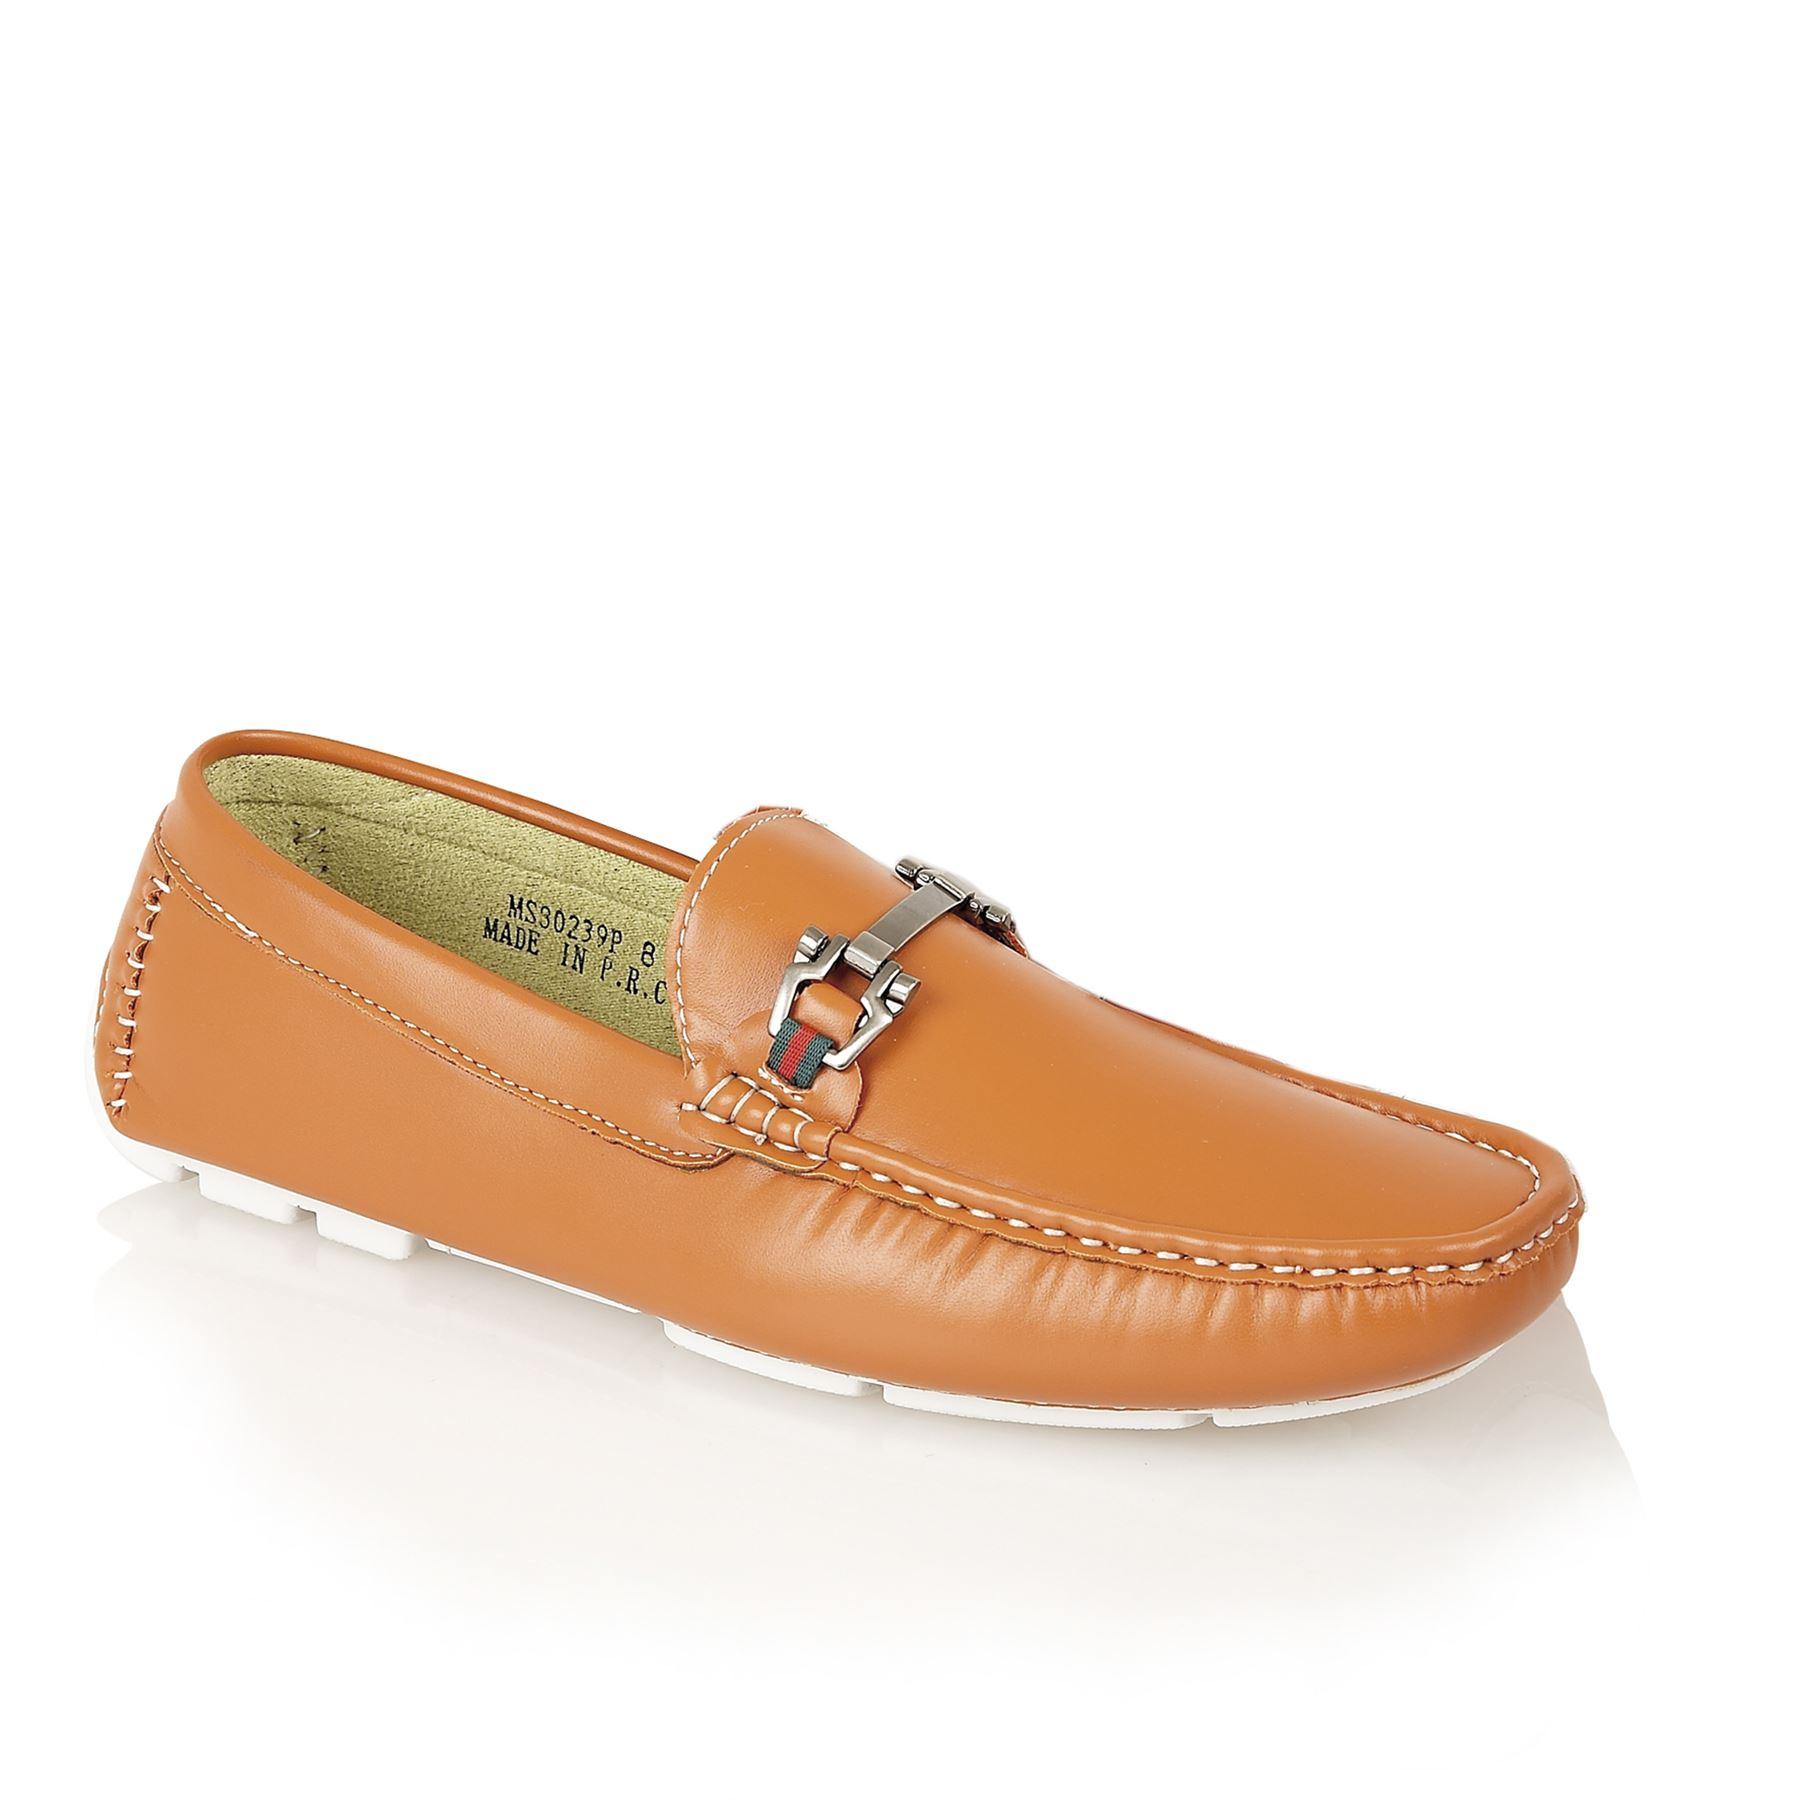 brit mens designer casual loafers moccasins driving